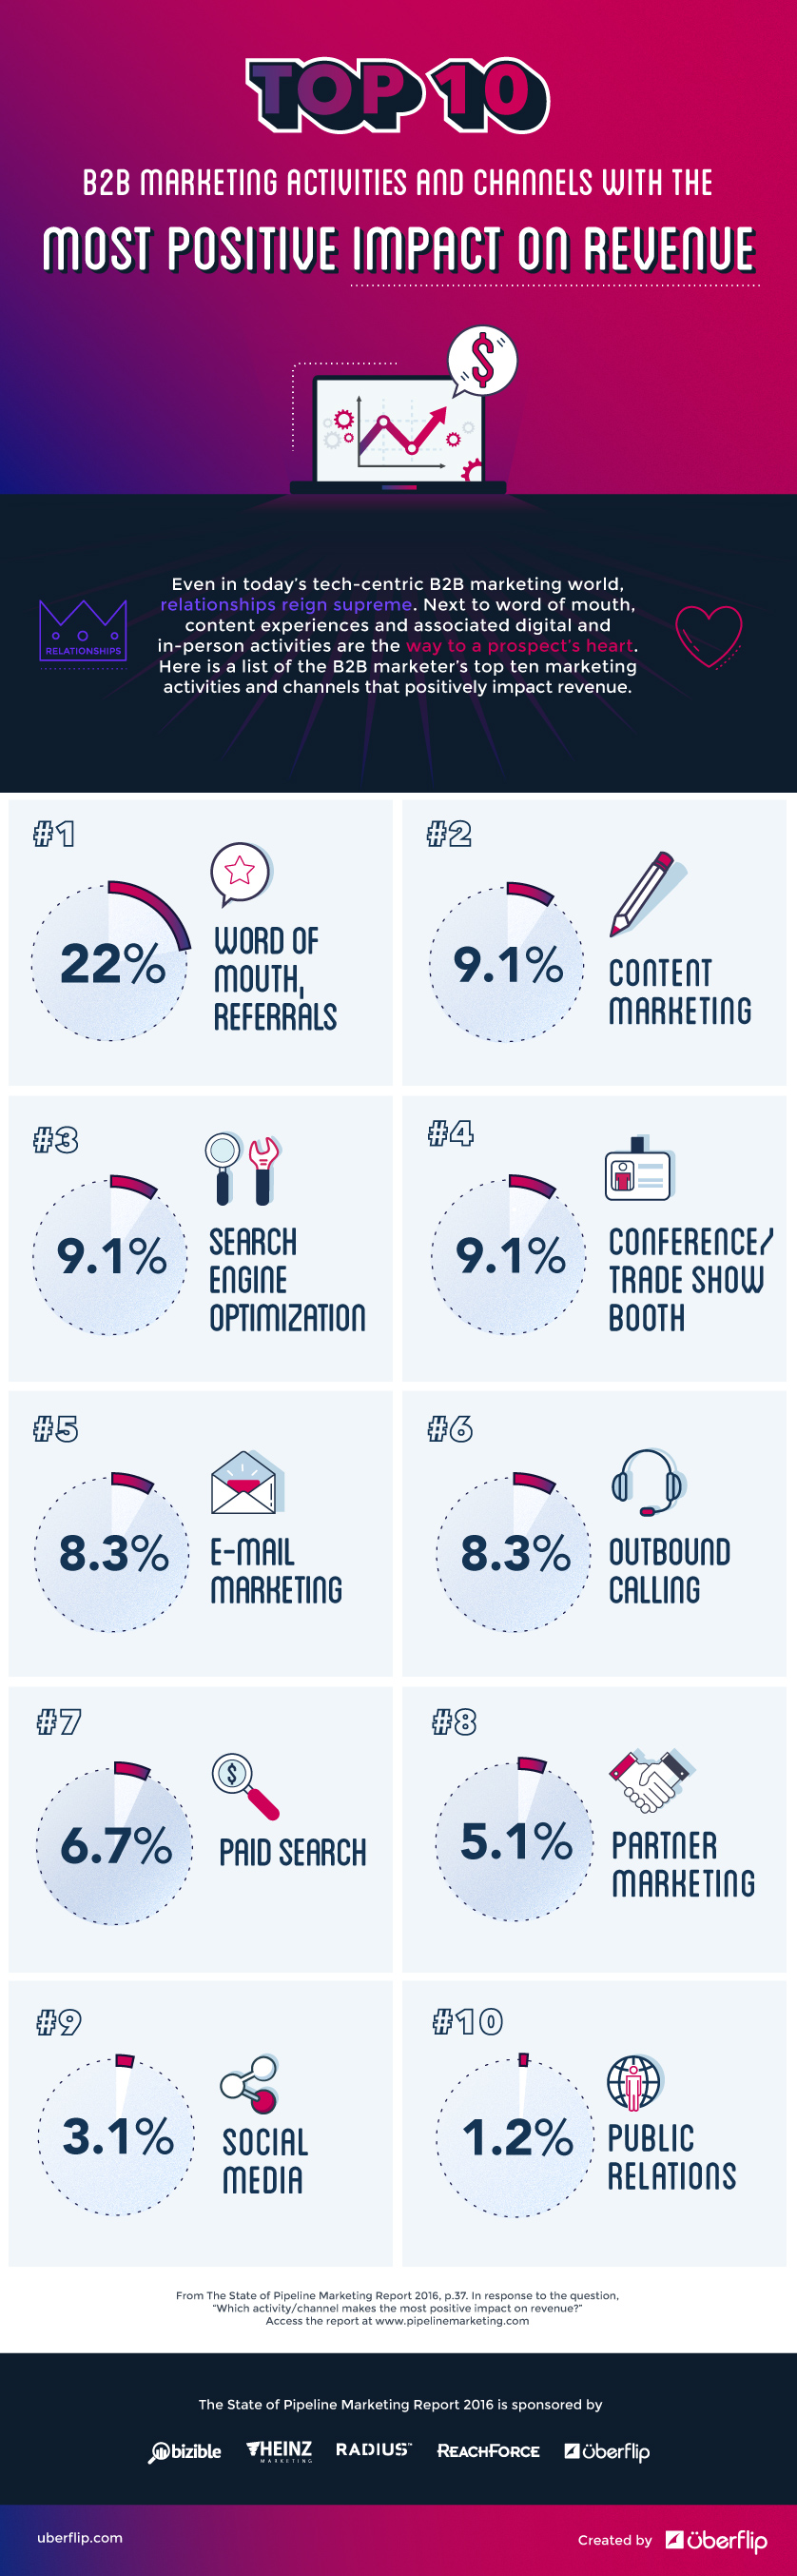 The Top 10 Revenue Impacting Marketing Activities